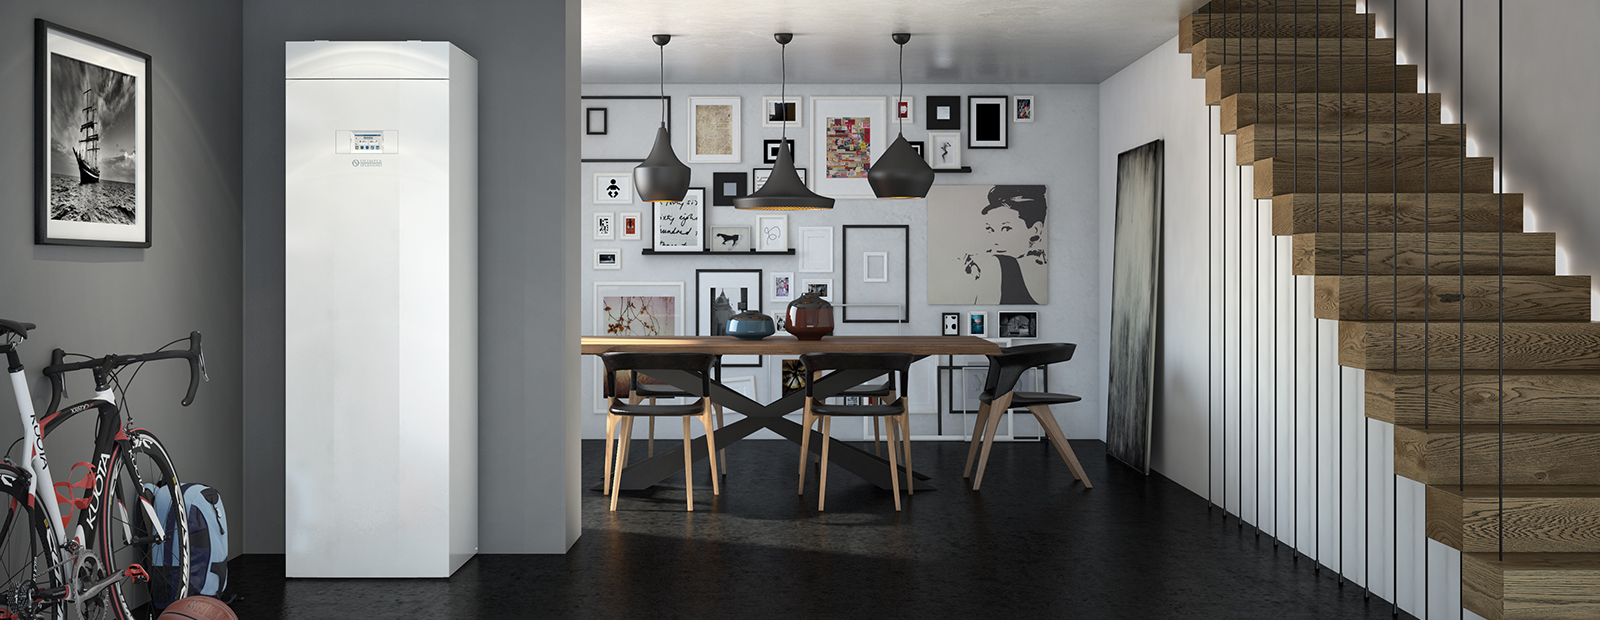 sherpa aquadue tower olimpia splendid. Black Bedroom Furniture Sets. Home Design Ideas